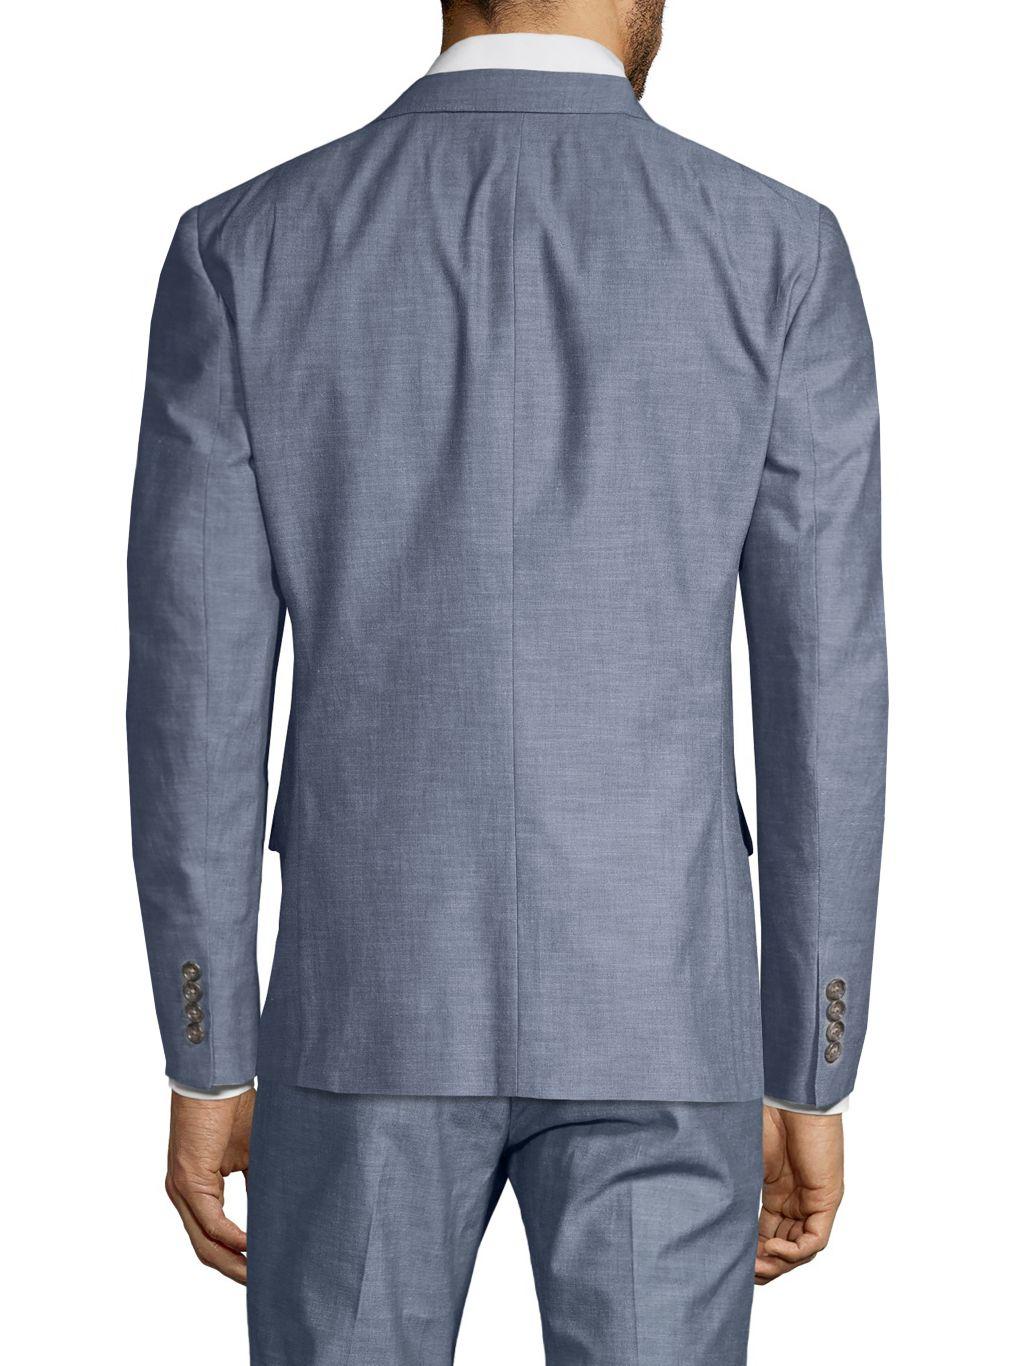 Bonobos Foundation Slim-Fit Chambray Jacket